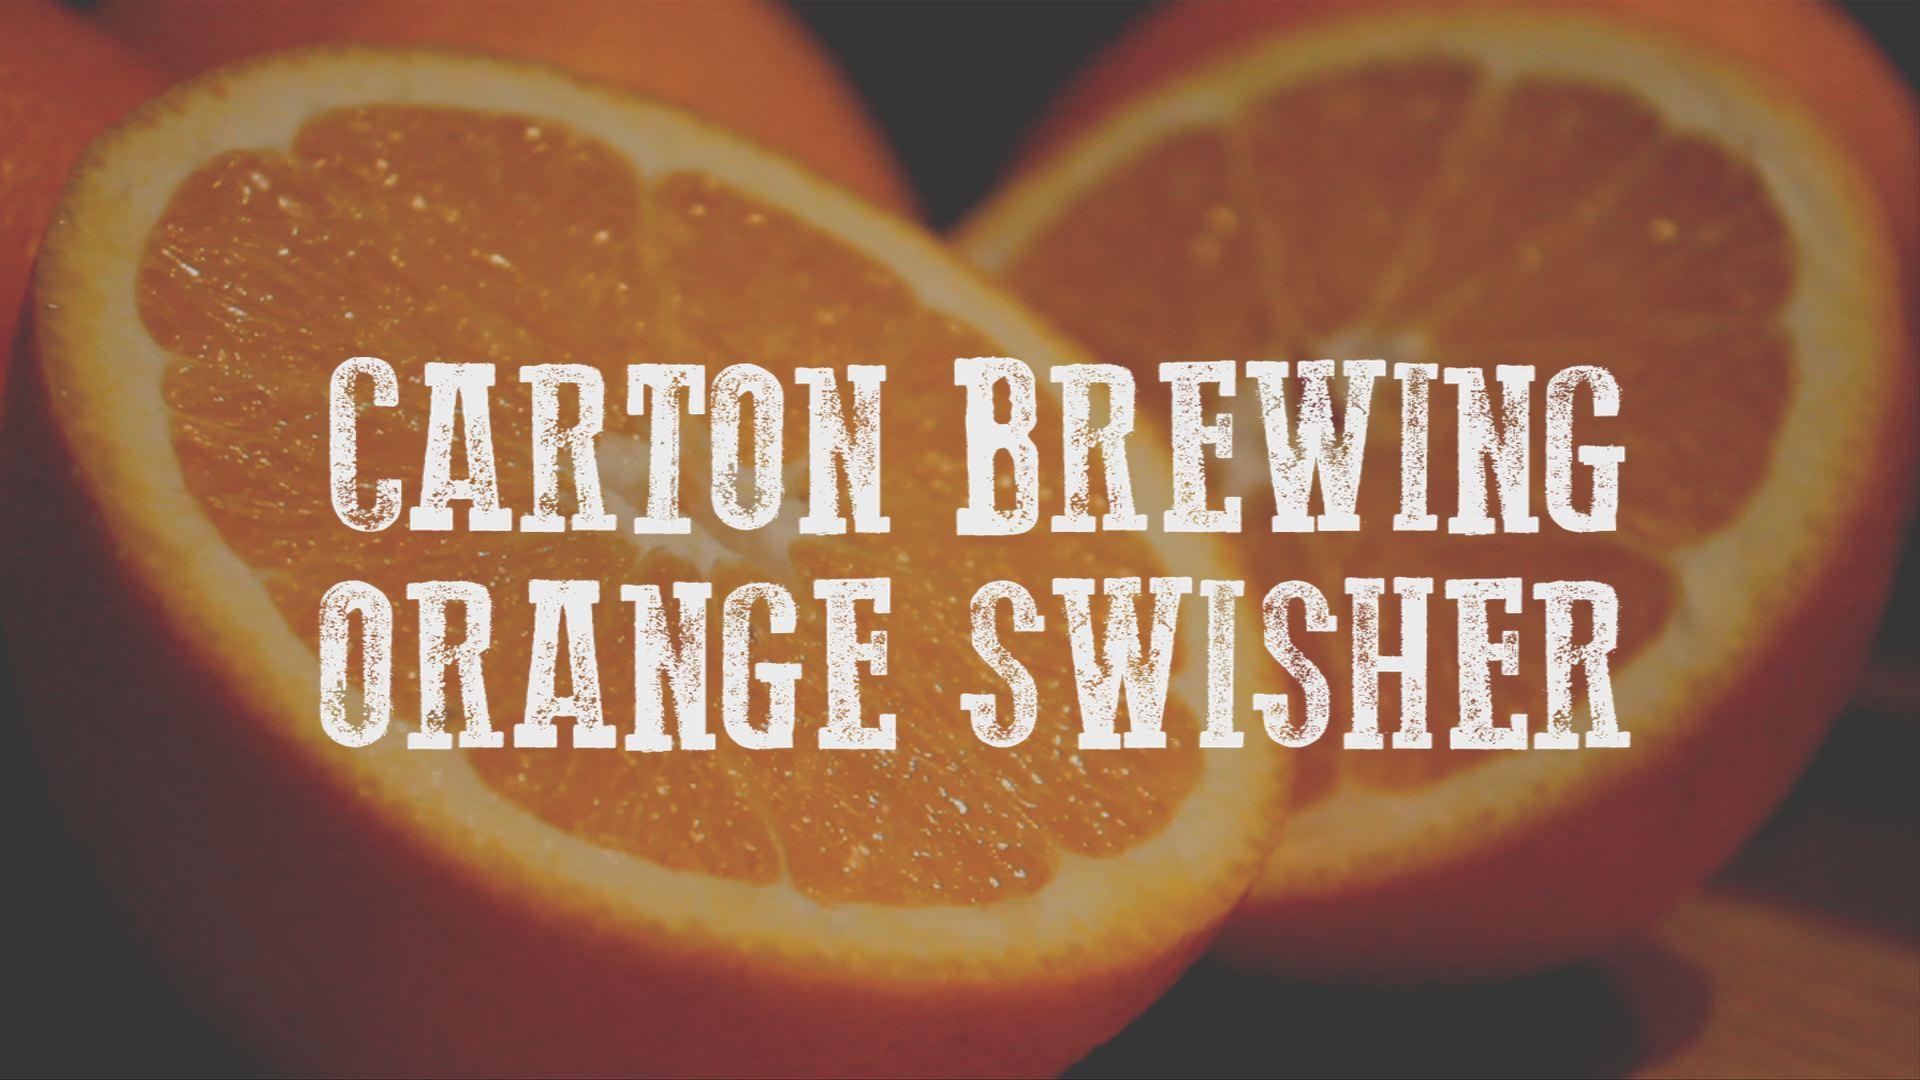 CARTON BREWING COMPANY ORANGE SWISHER BLOG